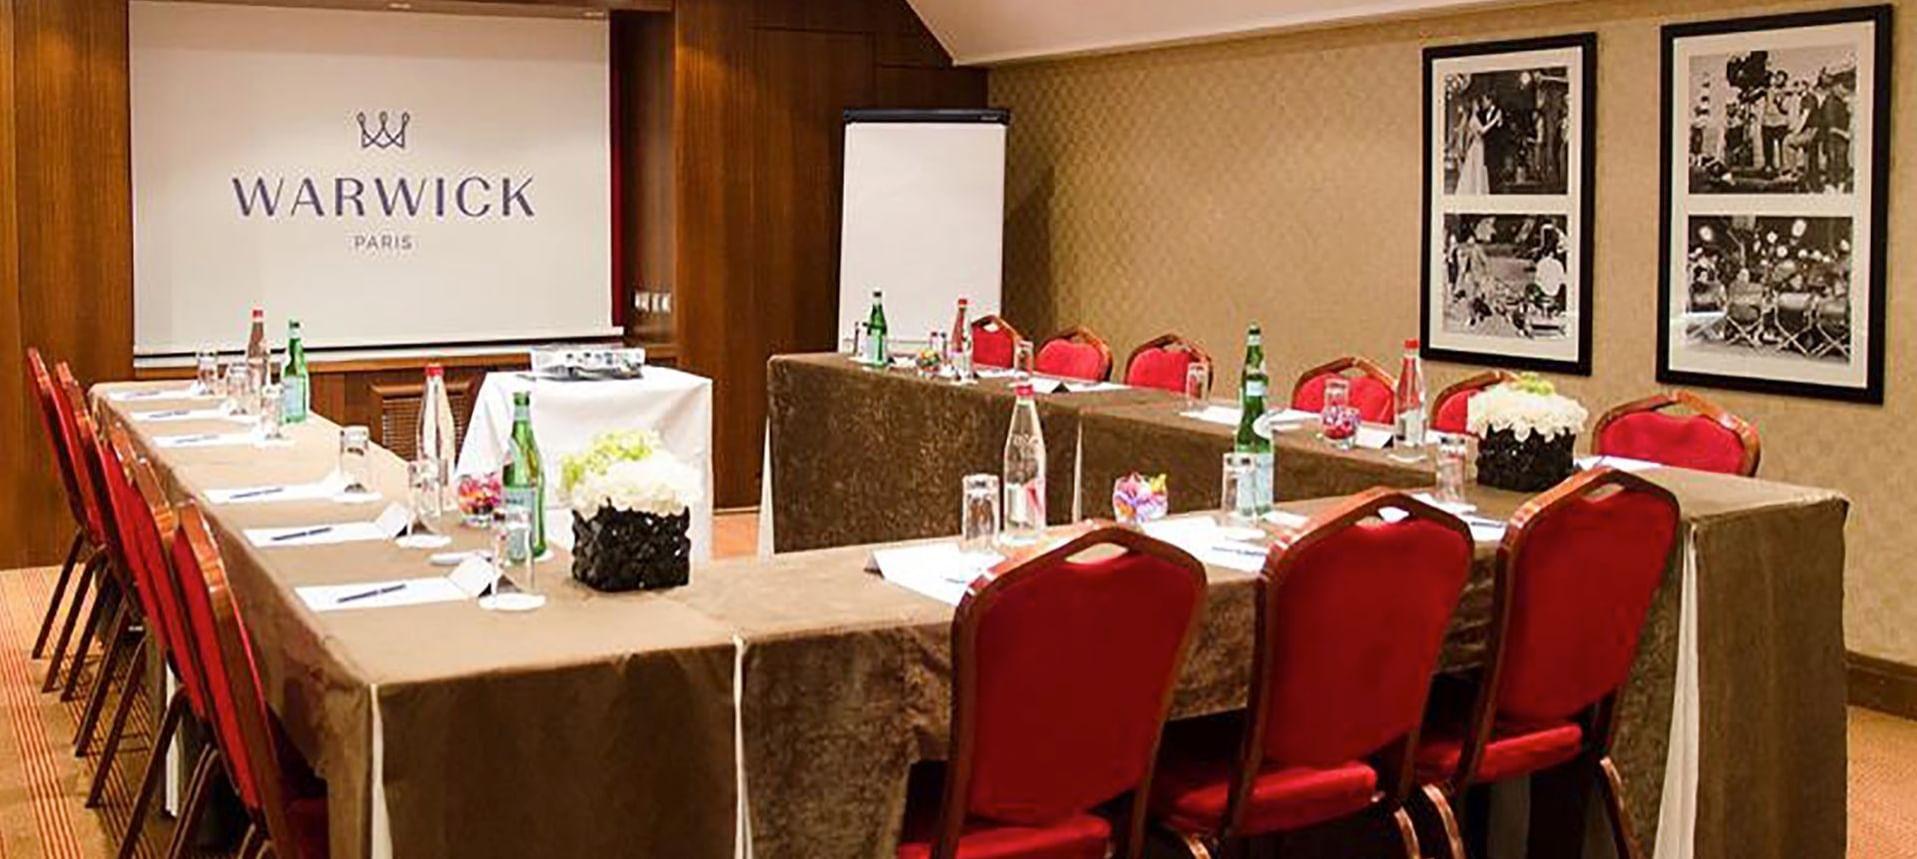 Meeting Room at Warwick Paris